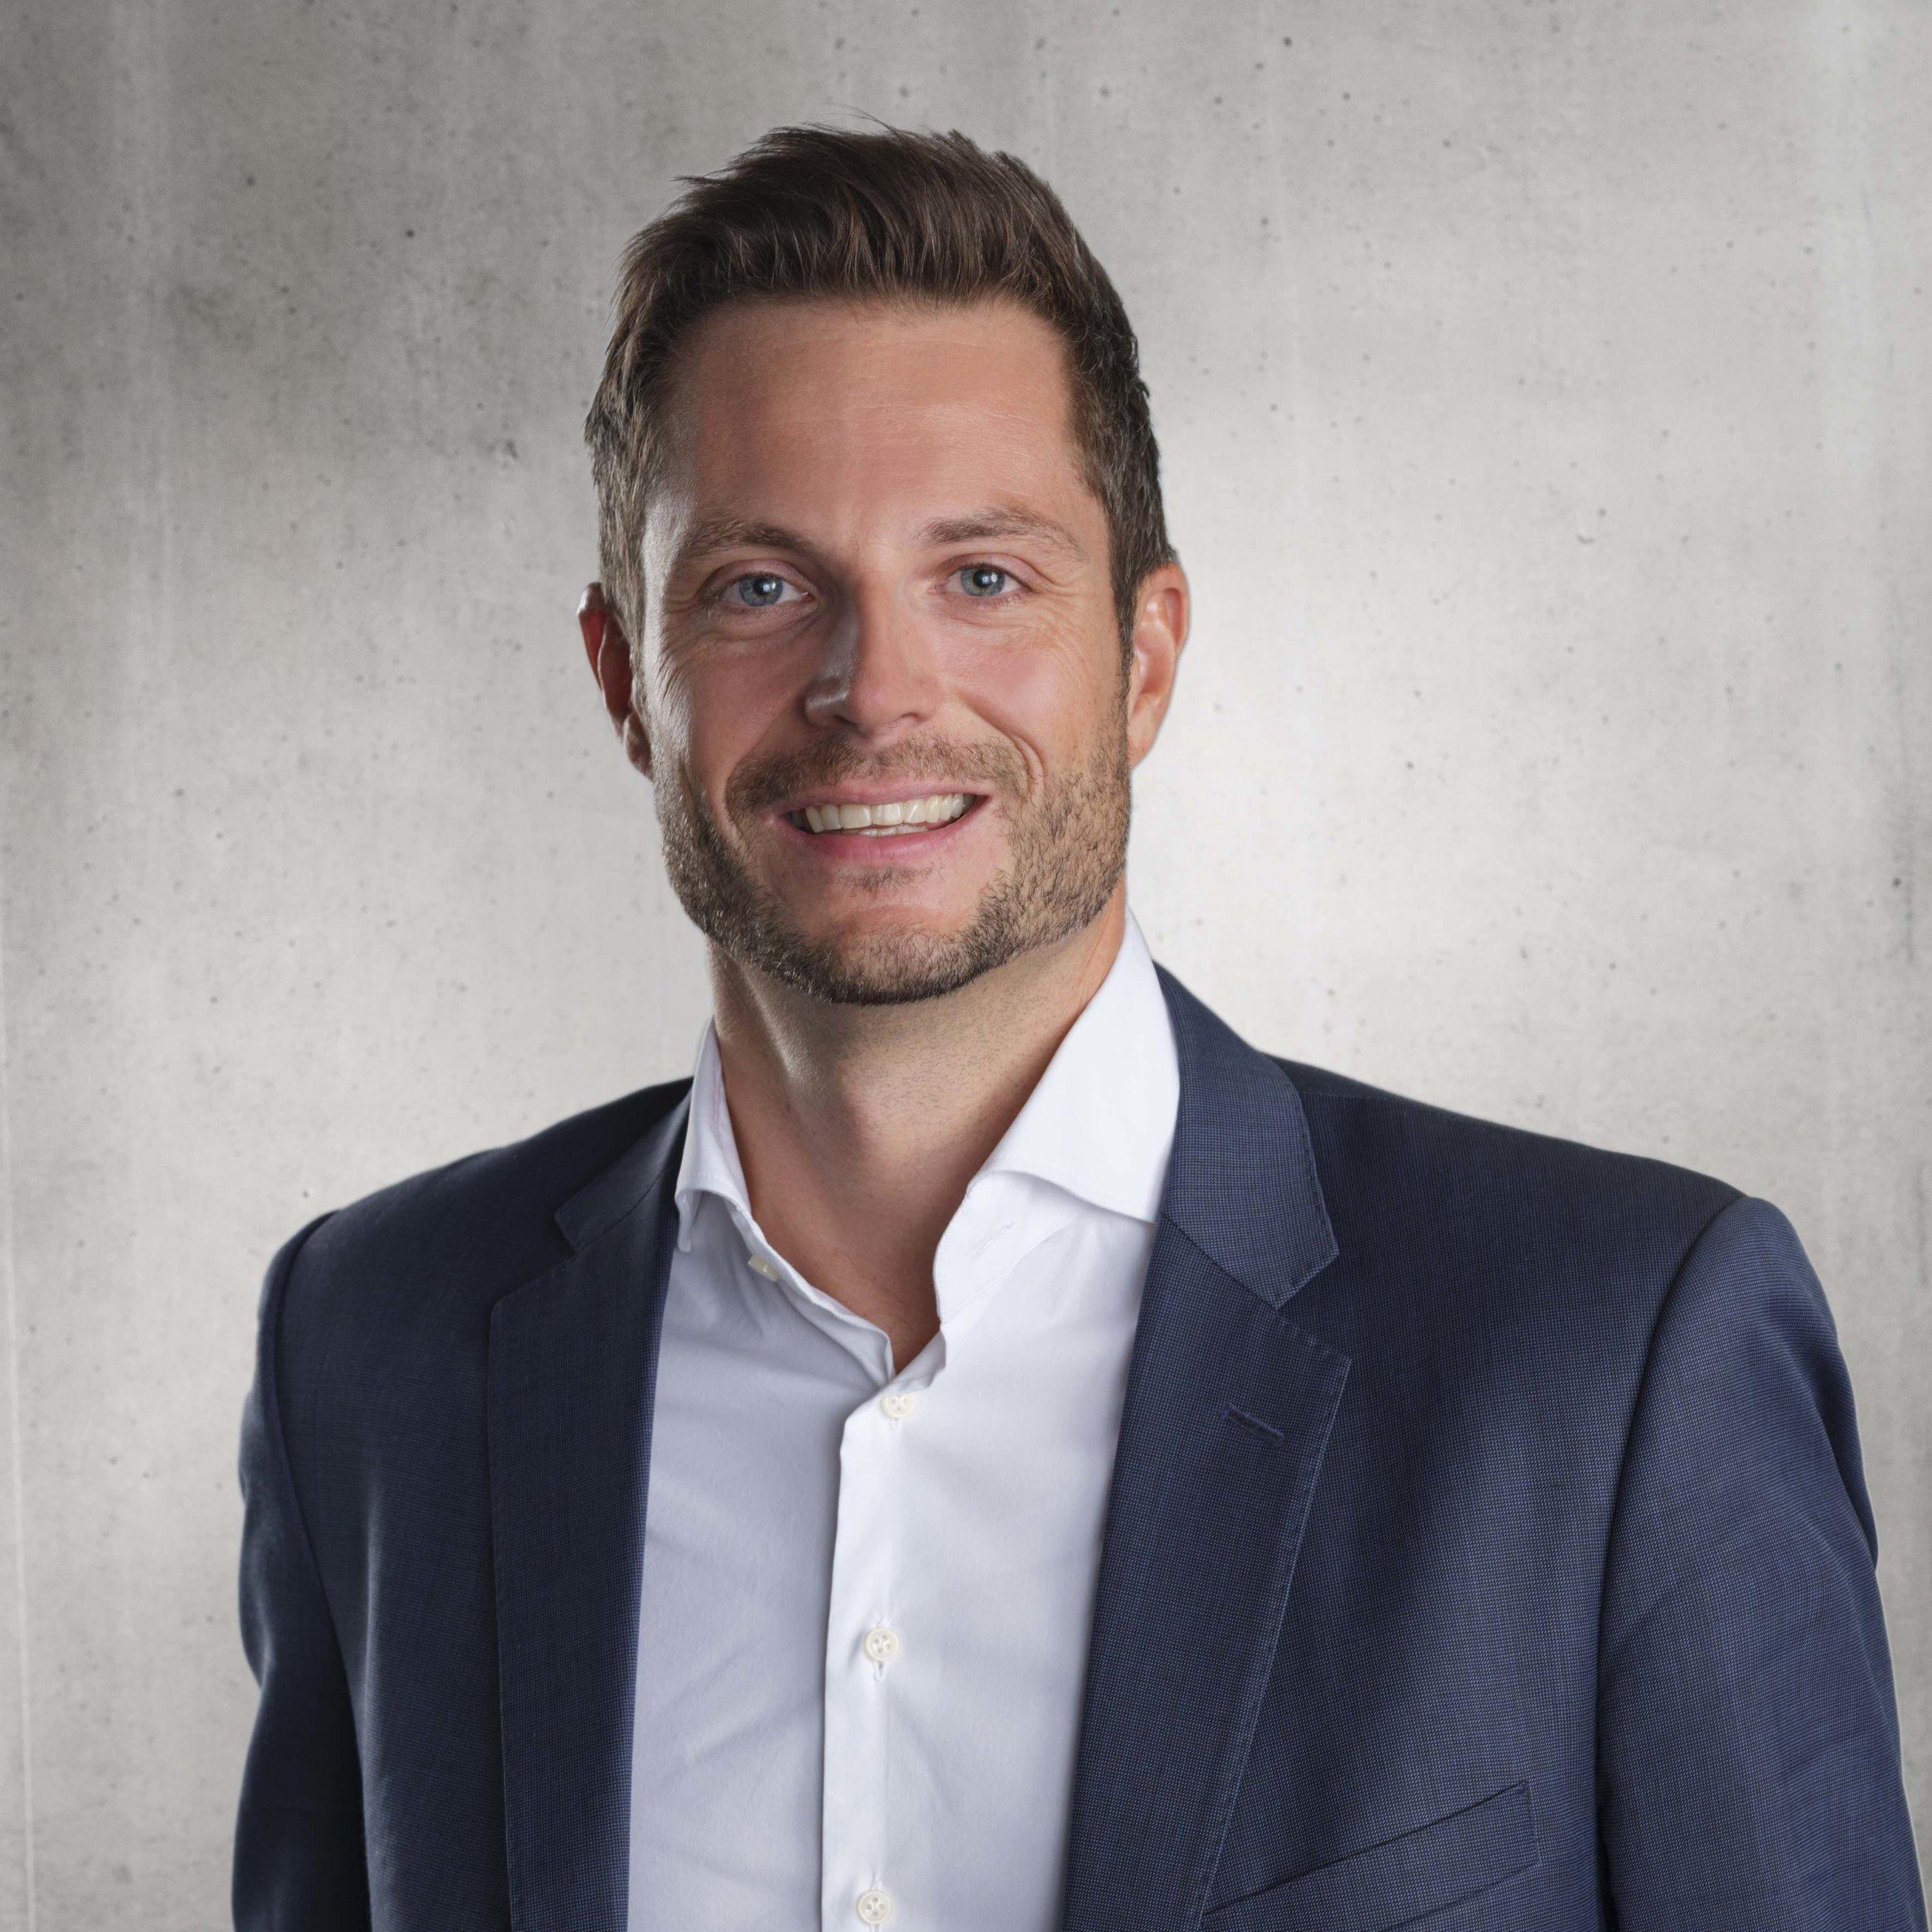 Thomas Aebli, Partner - Head of Investment Solutionsemail: thomas.aebli@anovapartners.comdirect no.: +41 44 215 24 60